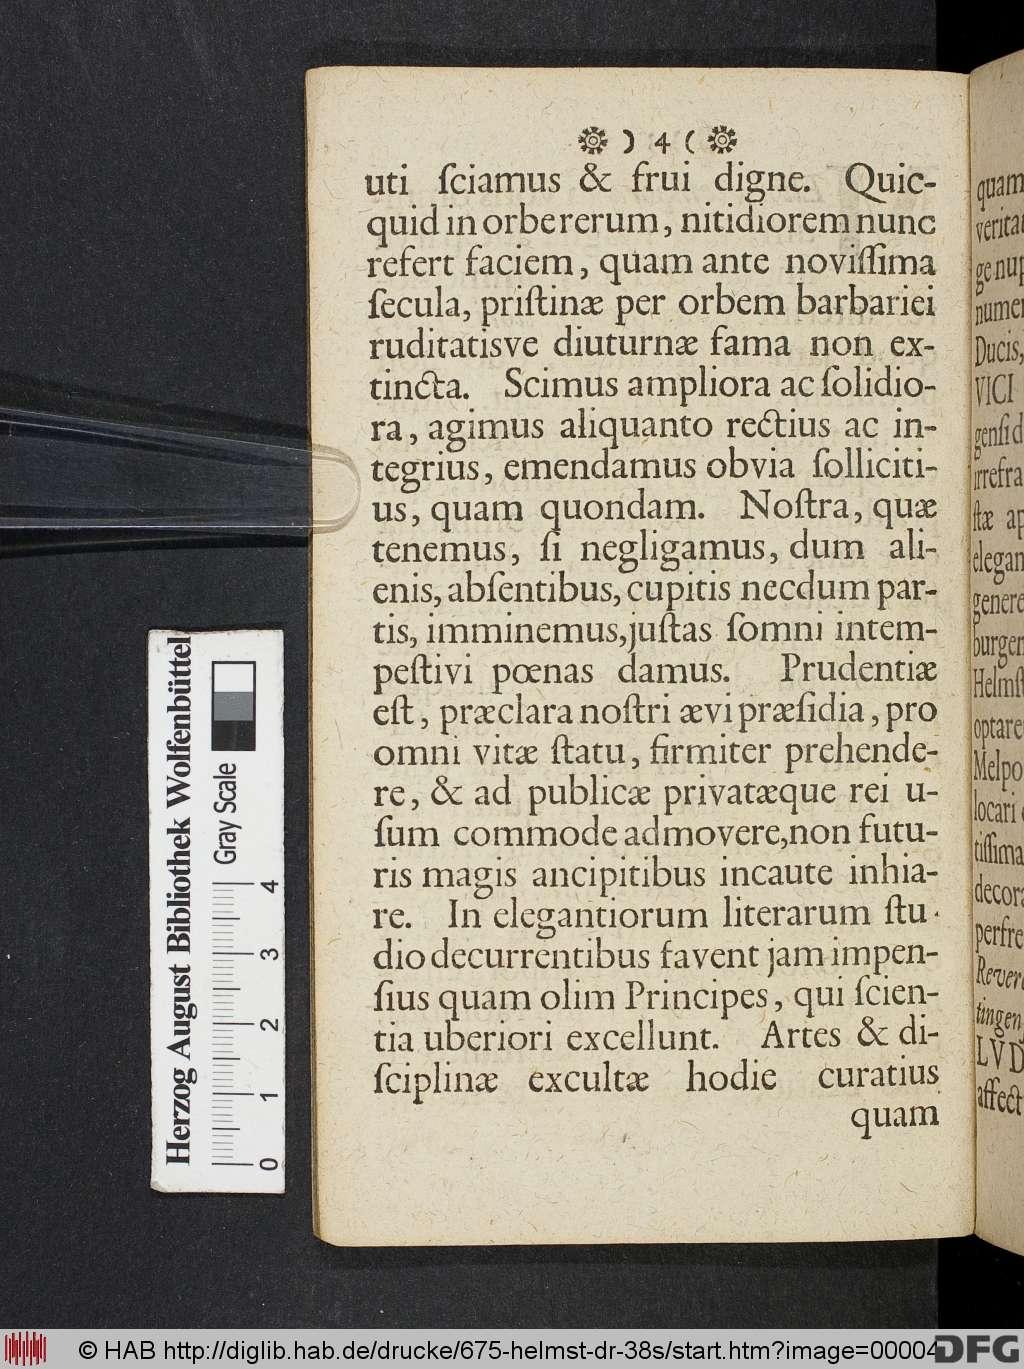 https://diglib.hab.de/drucke/675-helmst-dr-38s/00004.jpg